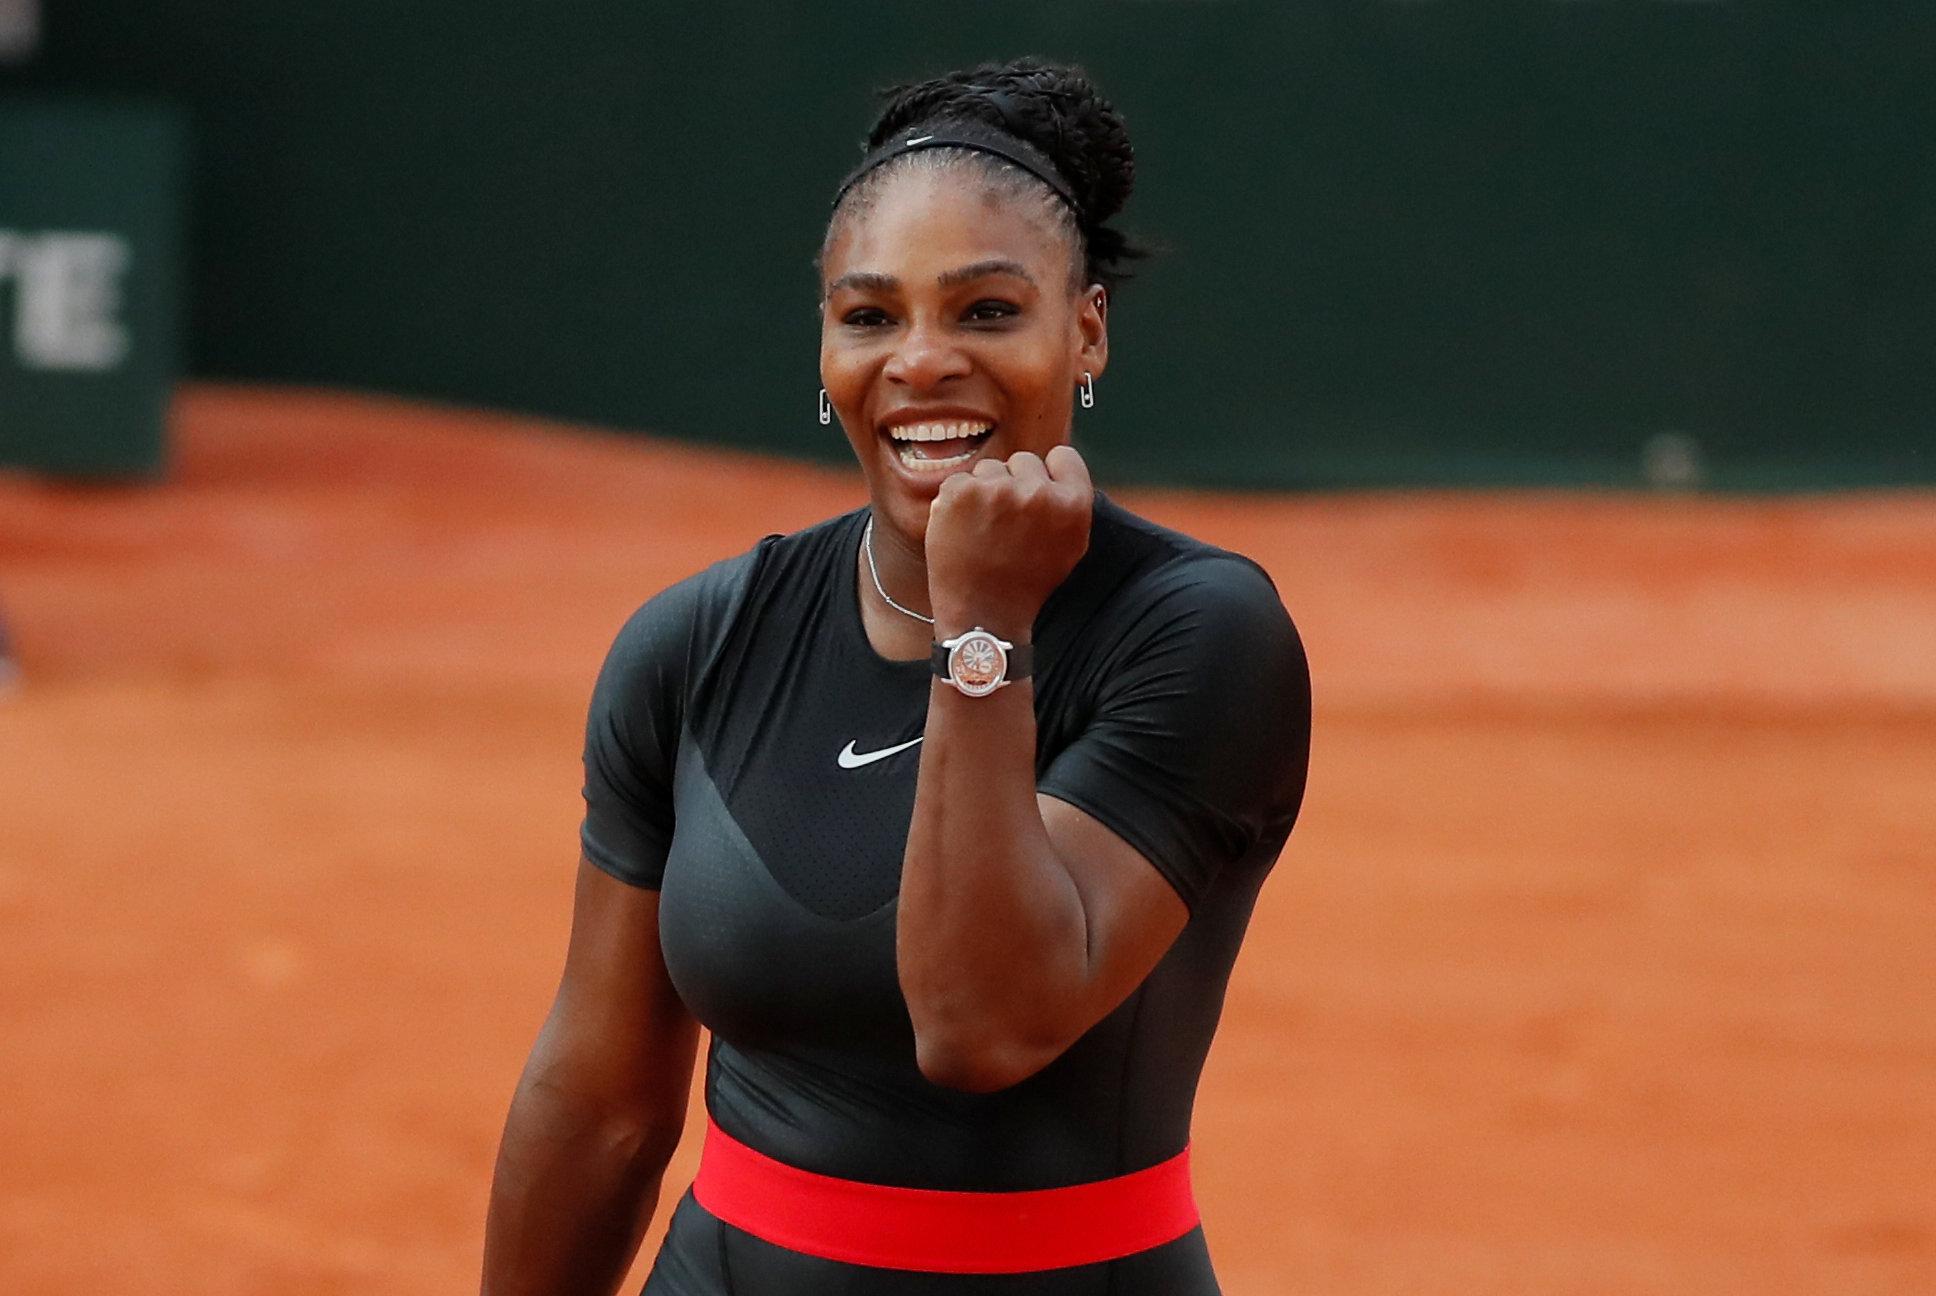 French Open: Serena sets up Sharapova blockbuster